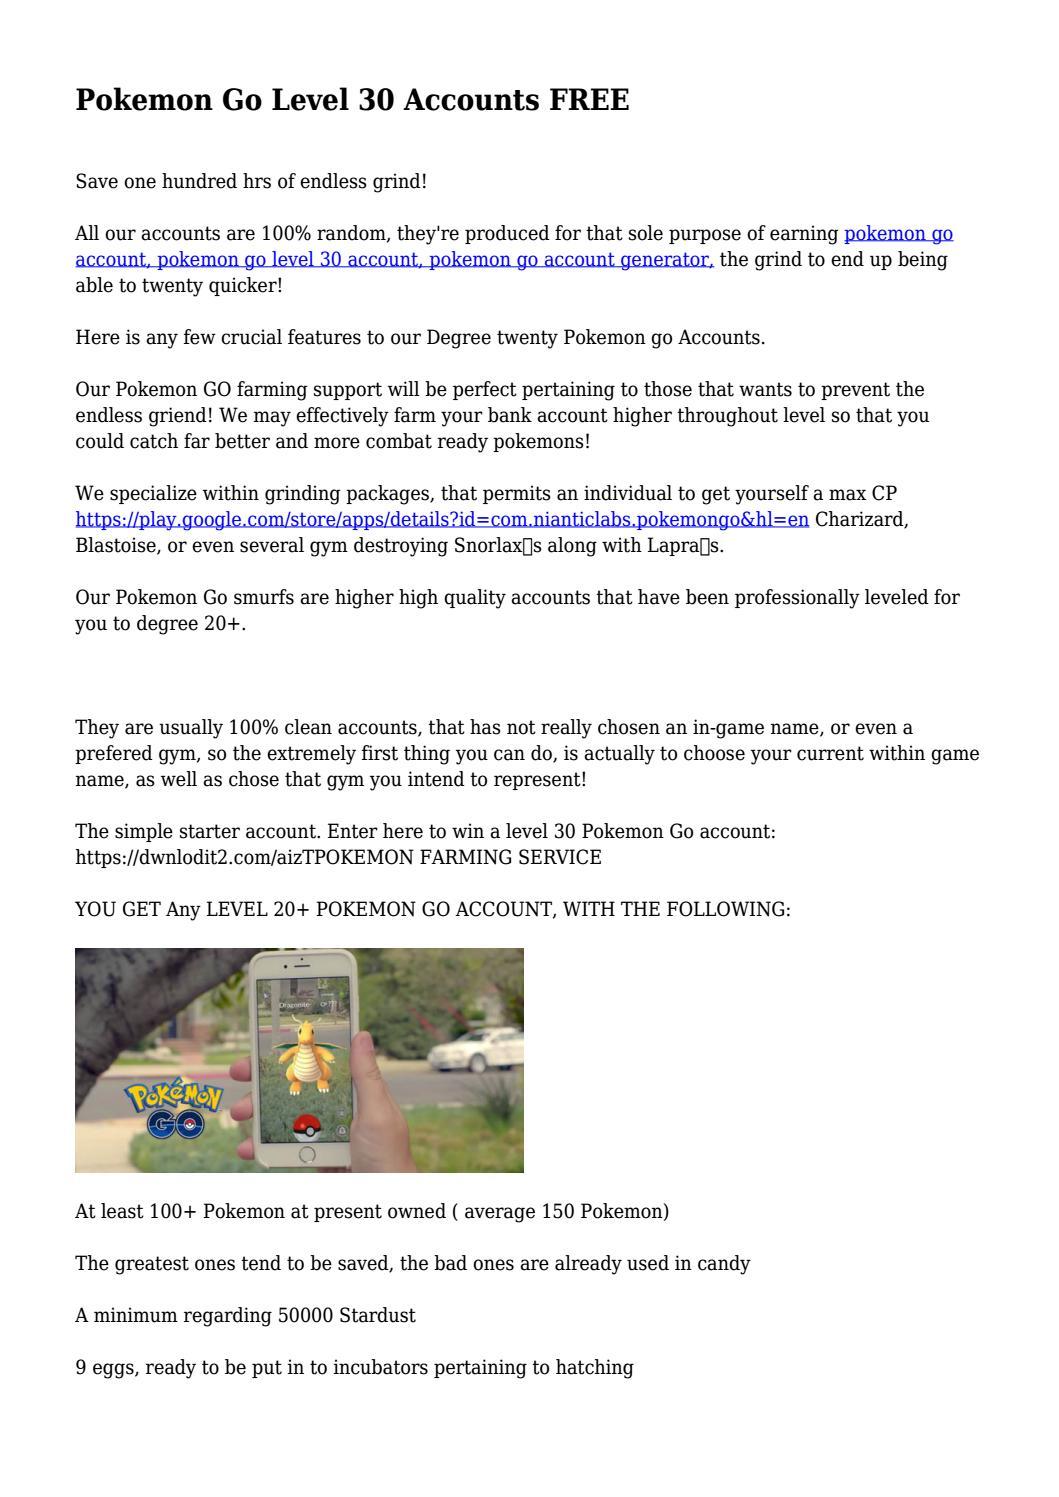 Pokemon Go Level 30 Accounts Free By Roweoviwgymymi Issuu